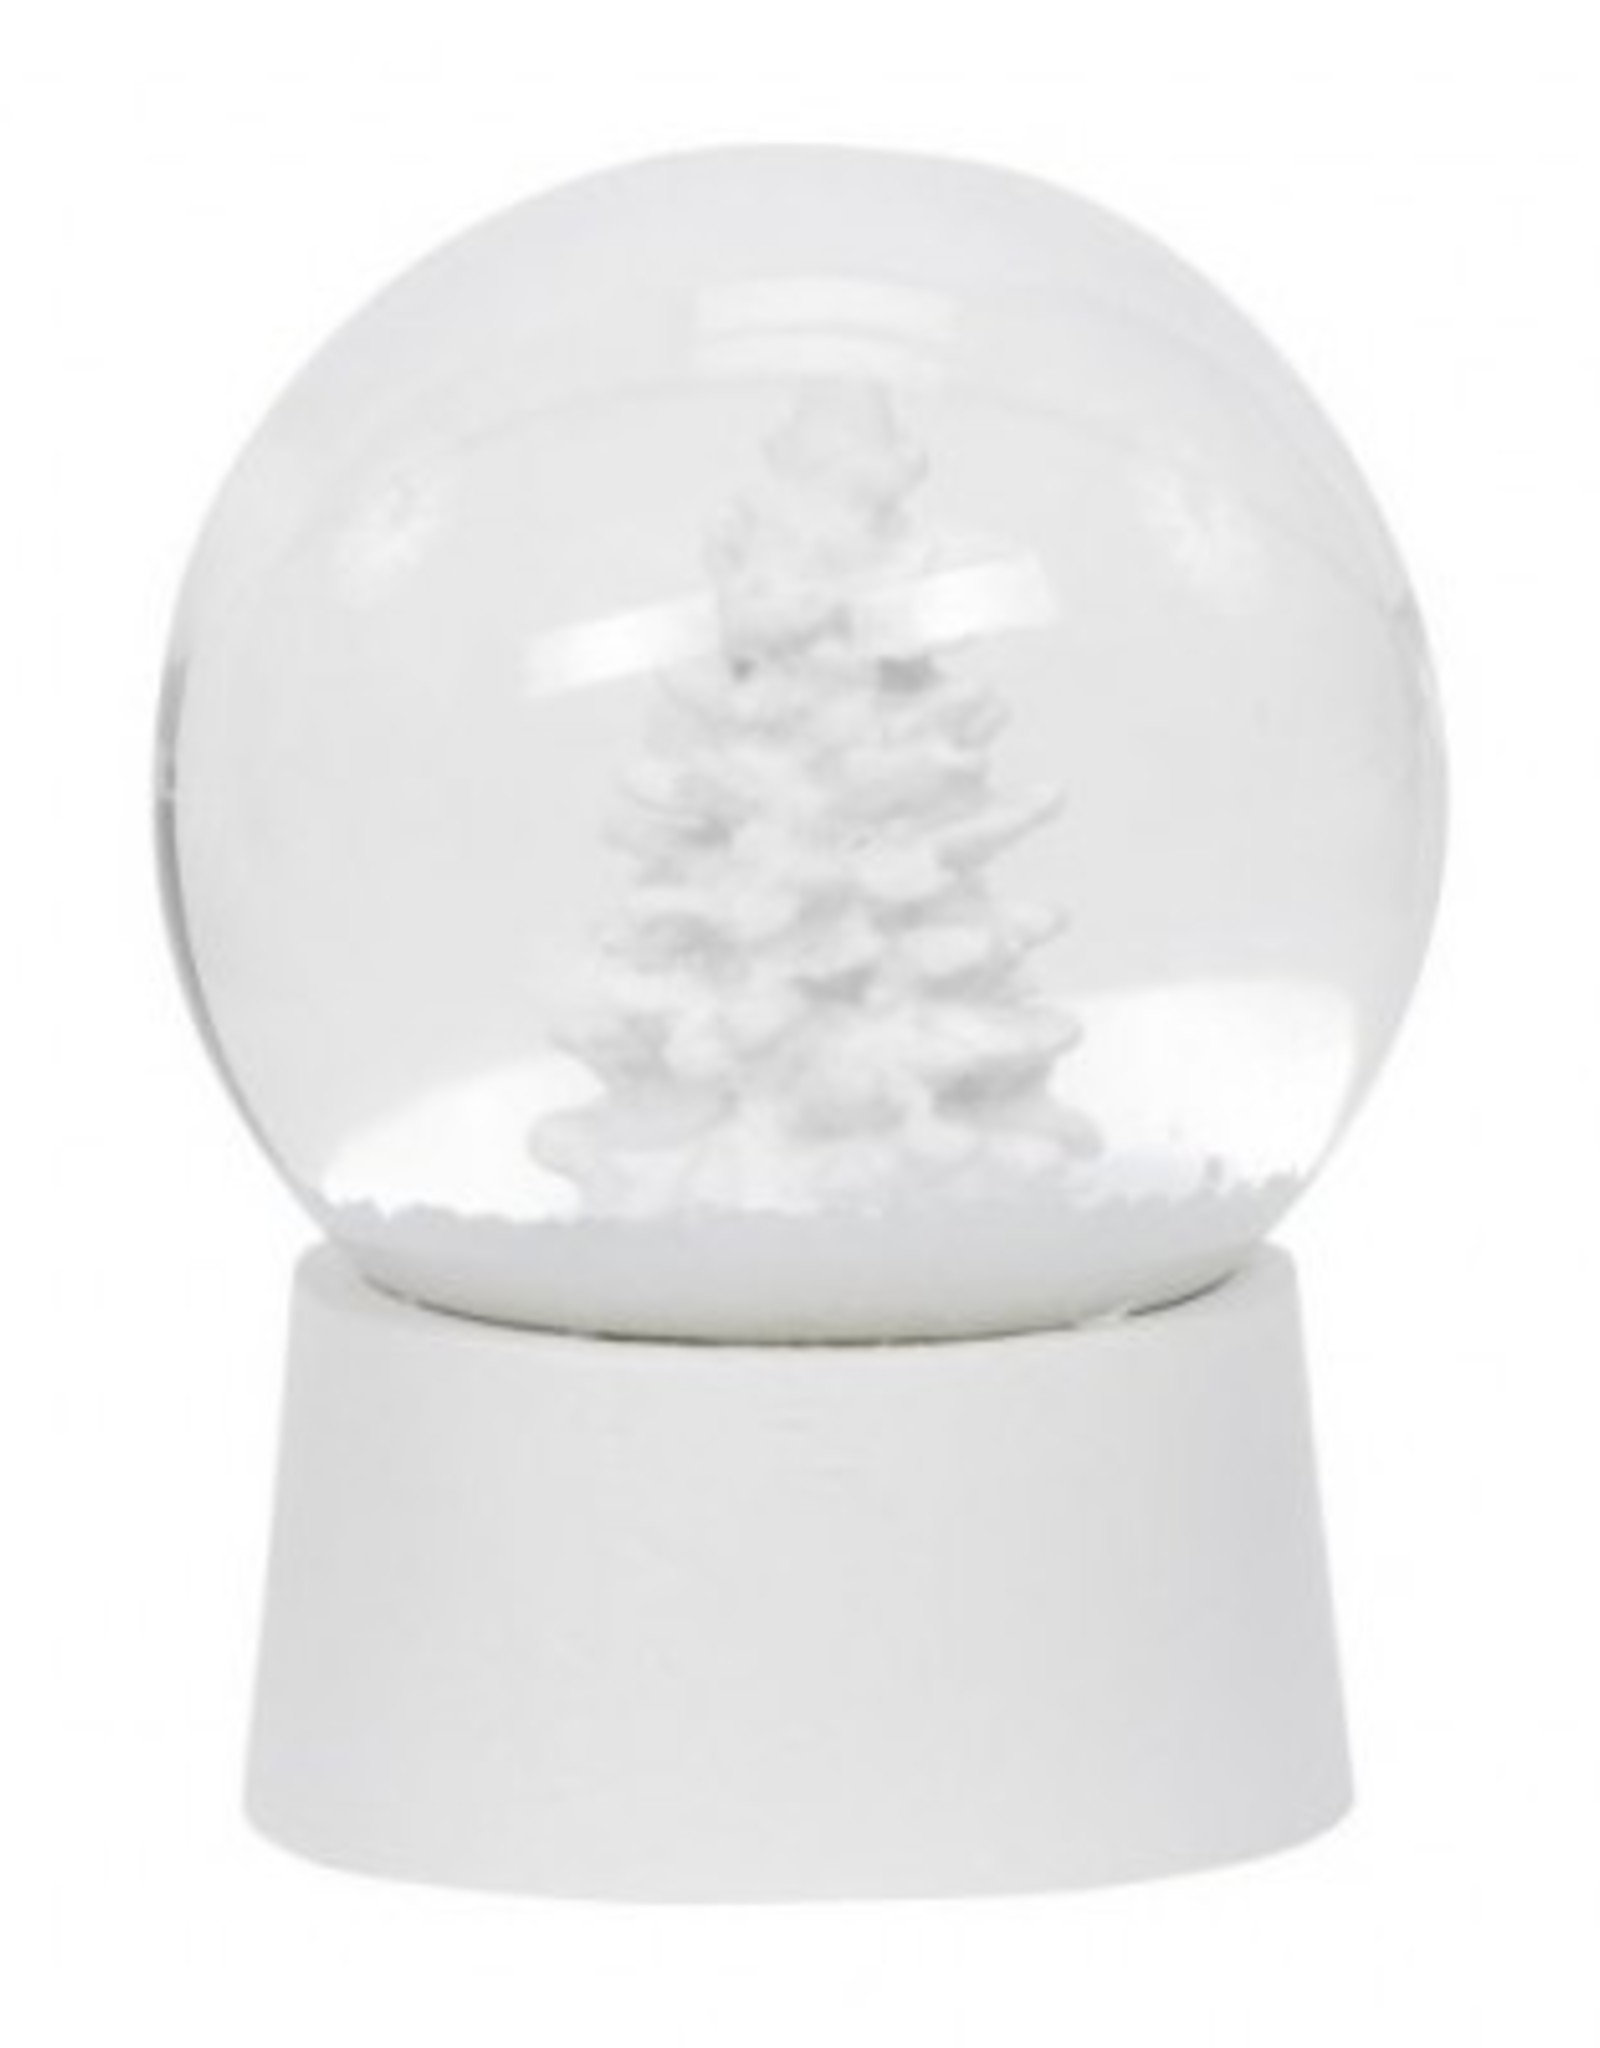 Sneeuwbol wit 5,5 cm